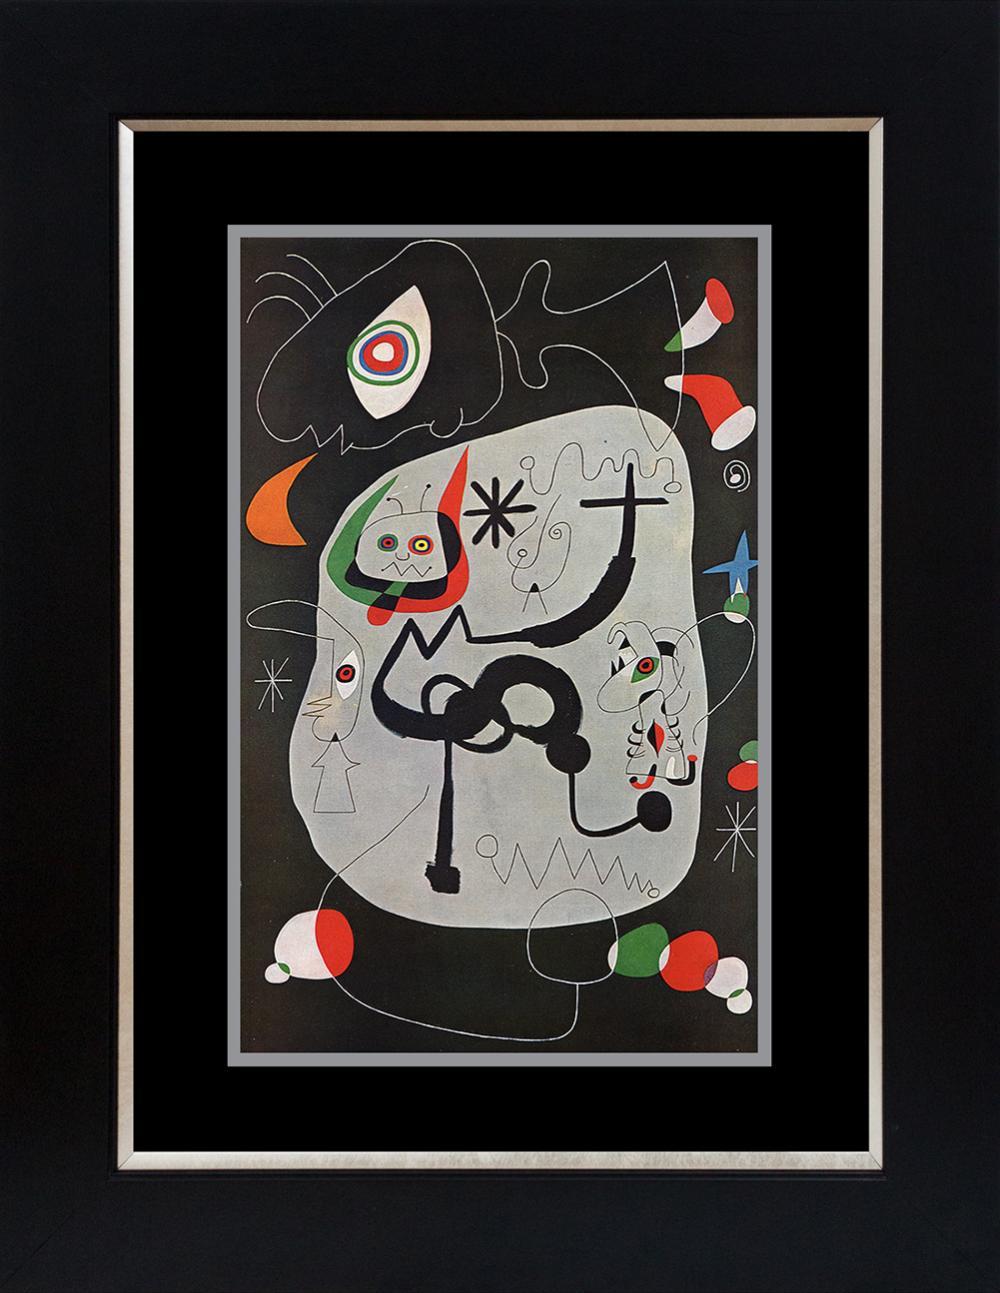 Lot 4158: Joan Miro Color Plate Lithograph